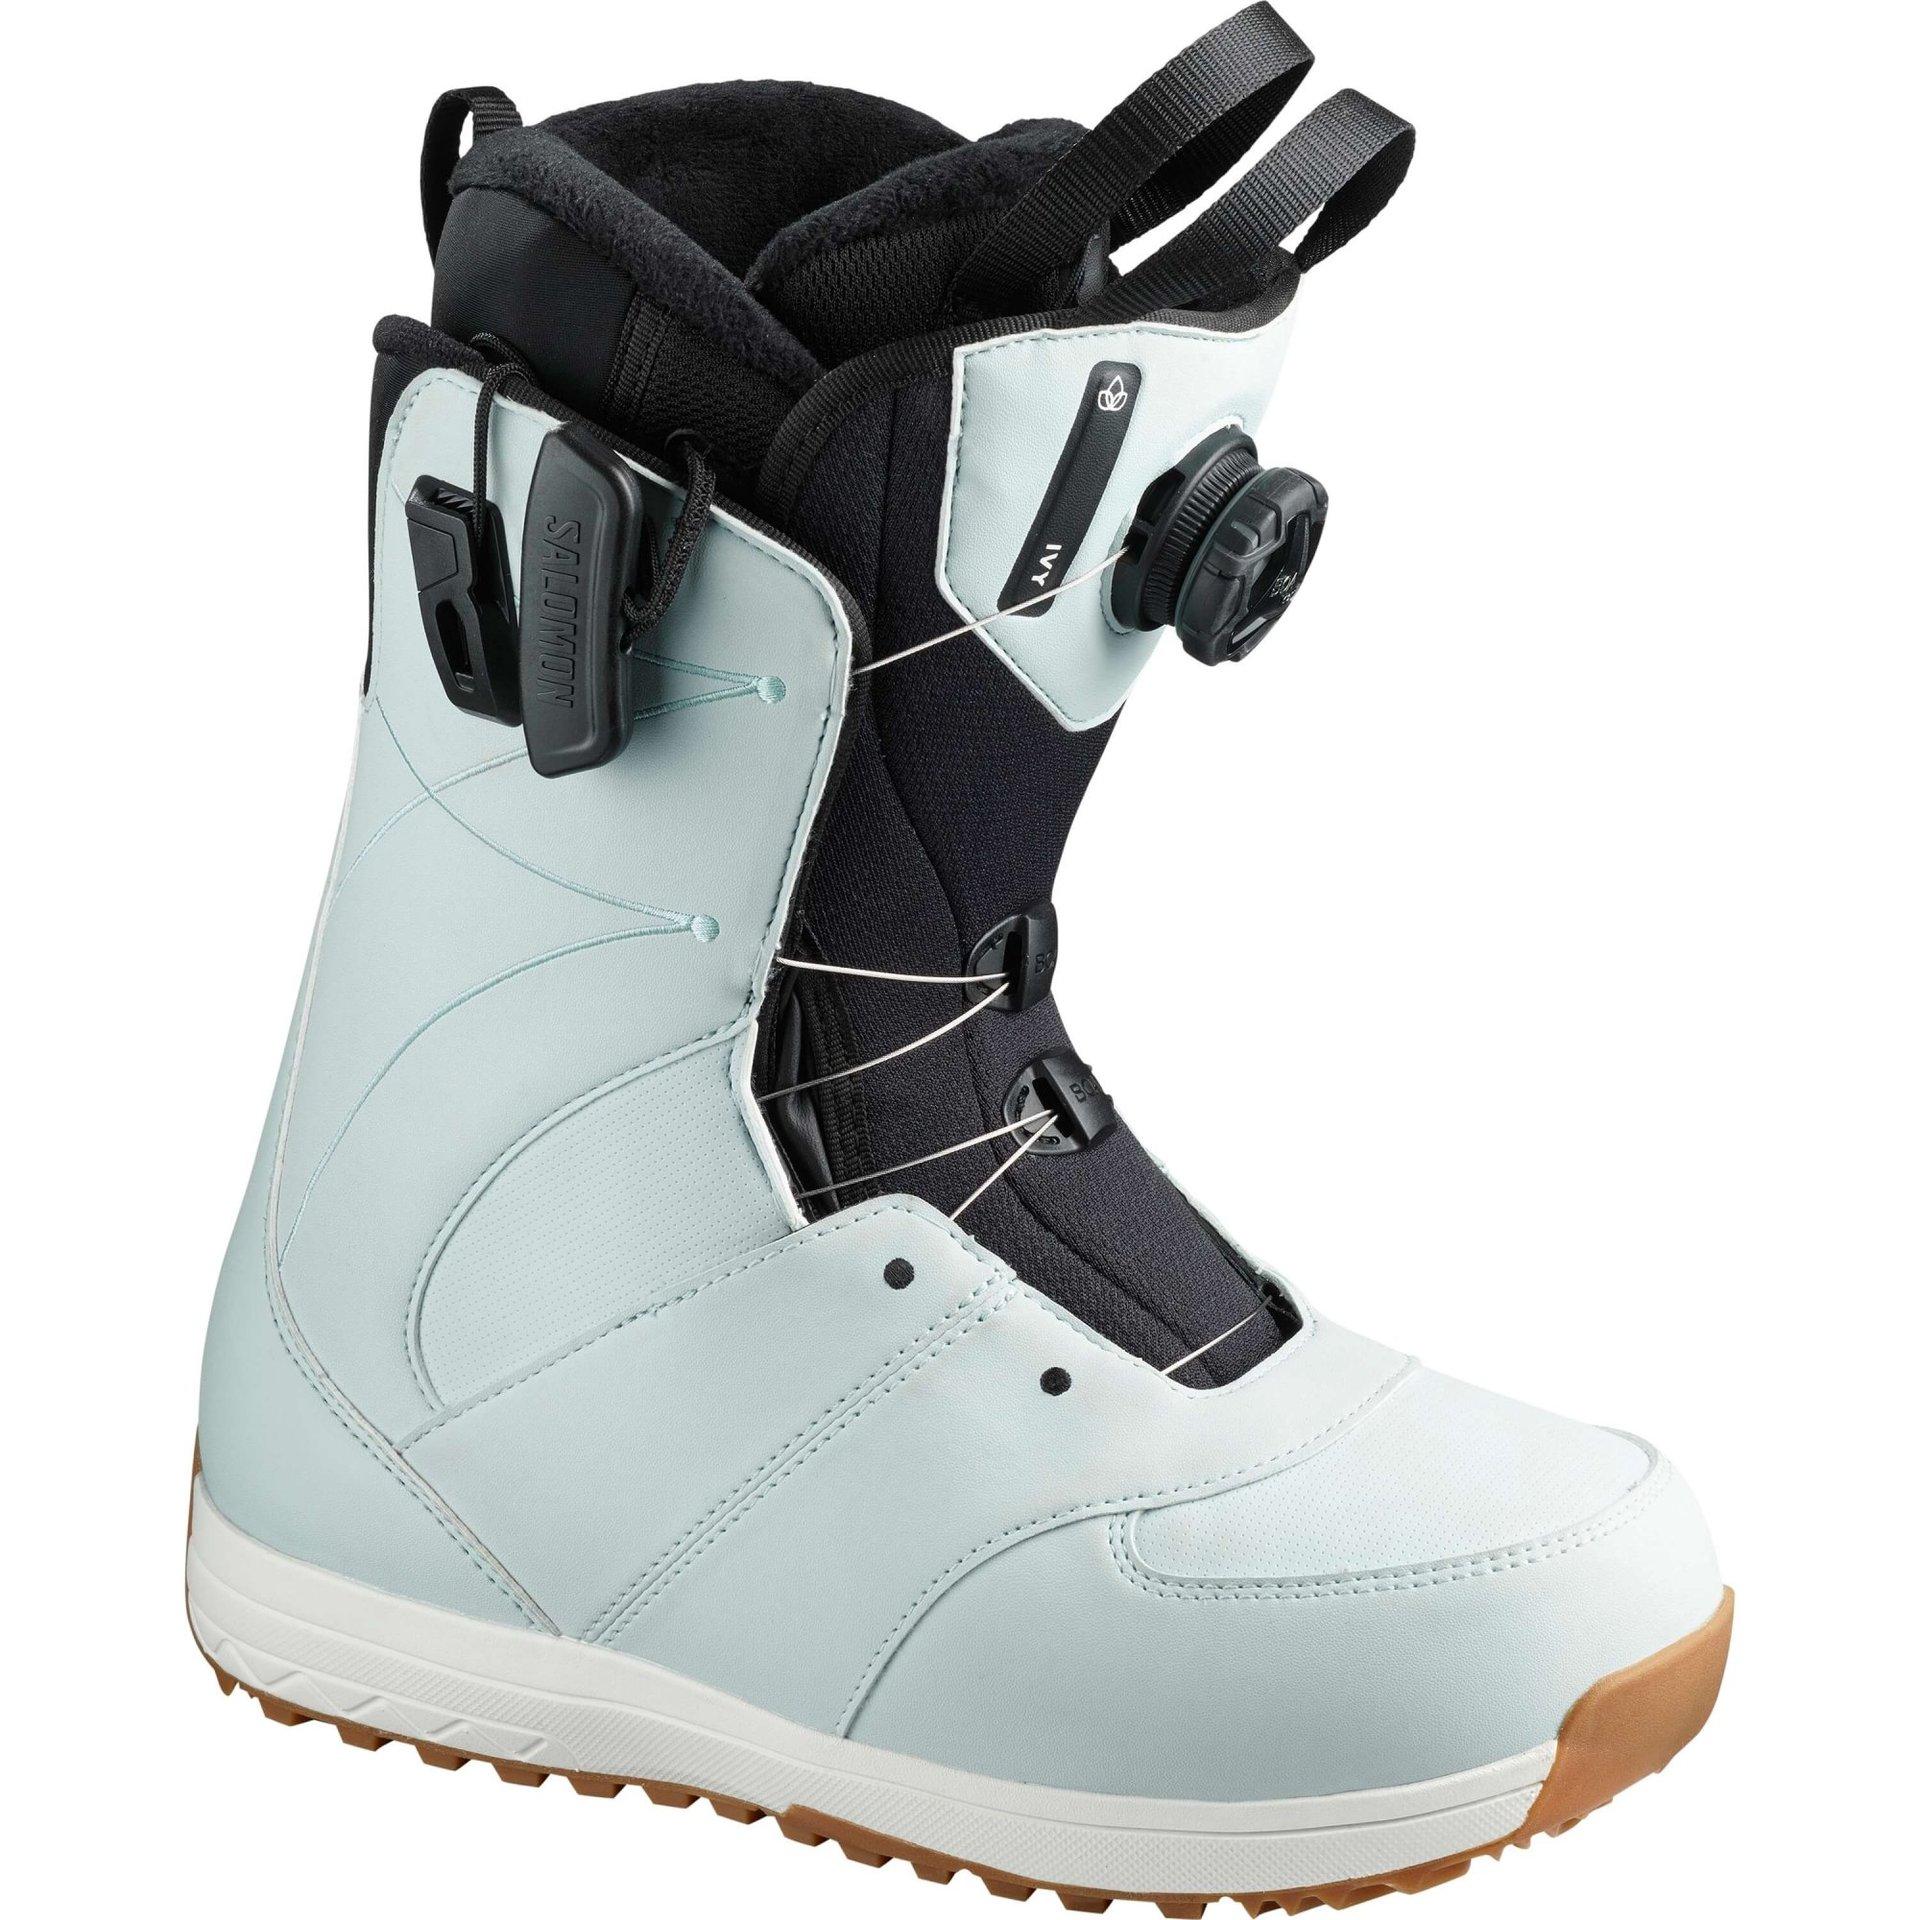 BUTY SNOWBOARDOWE SALOMON #IVY BOA SJ# 2020 BŁĘKITNY